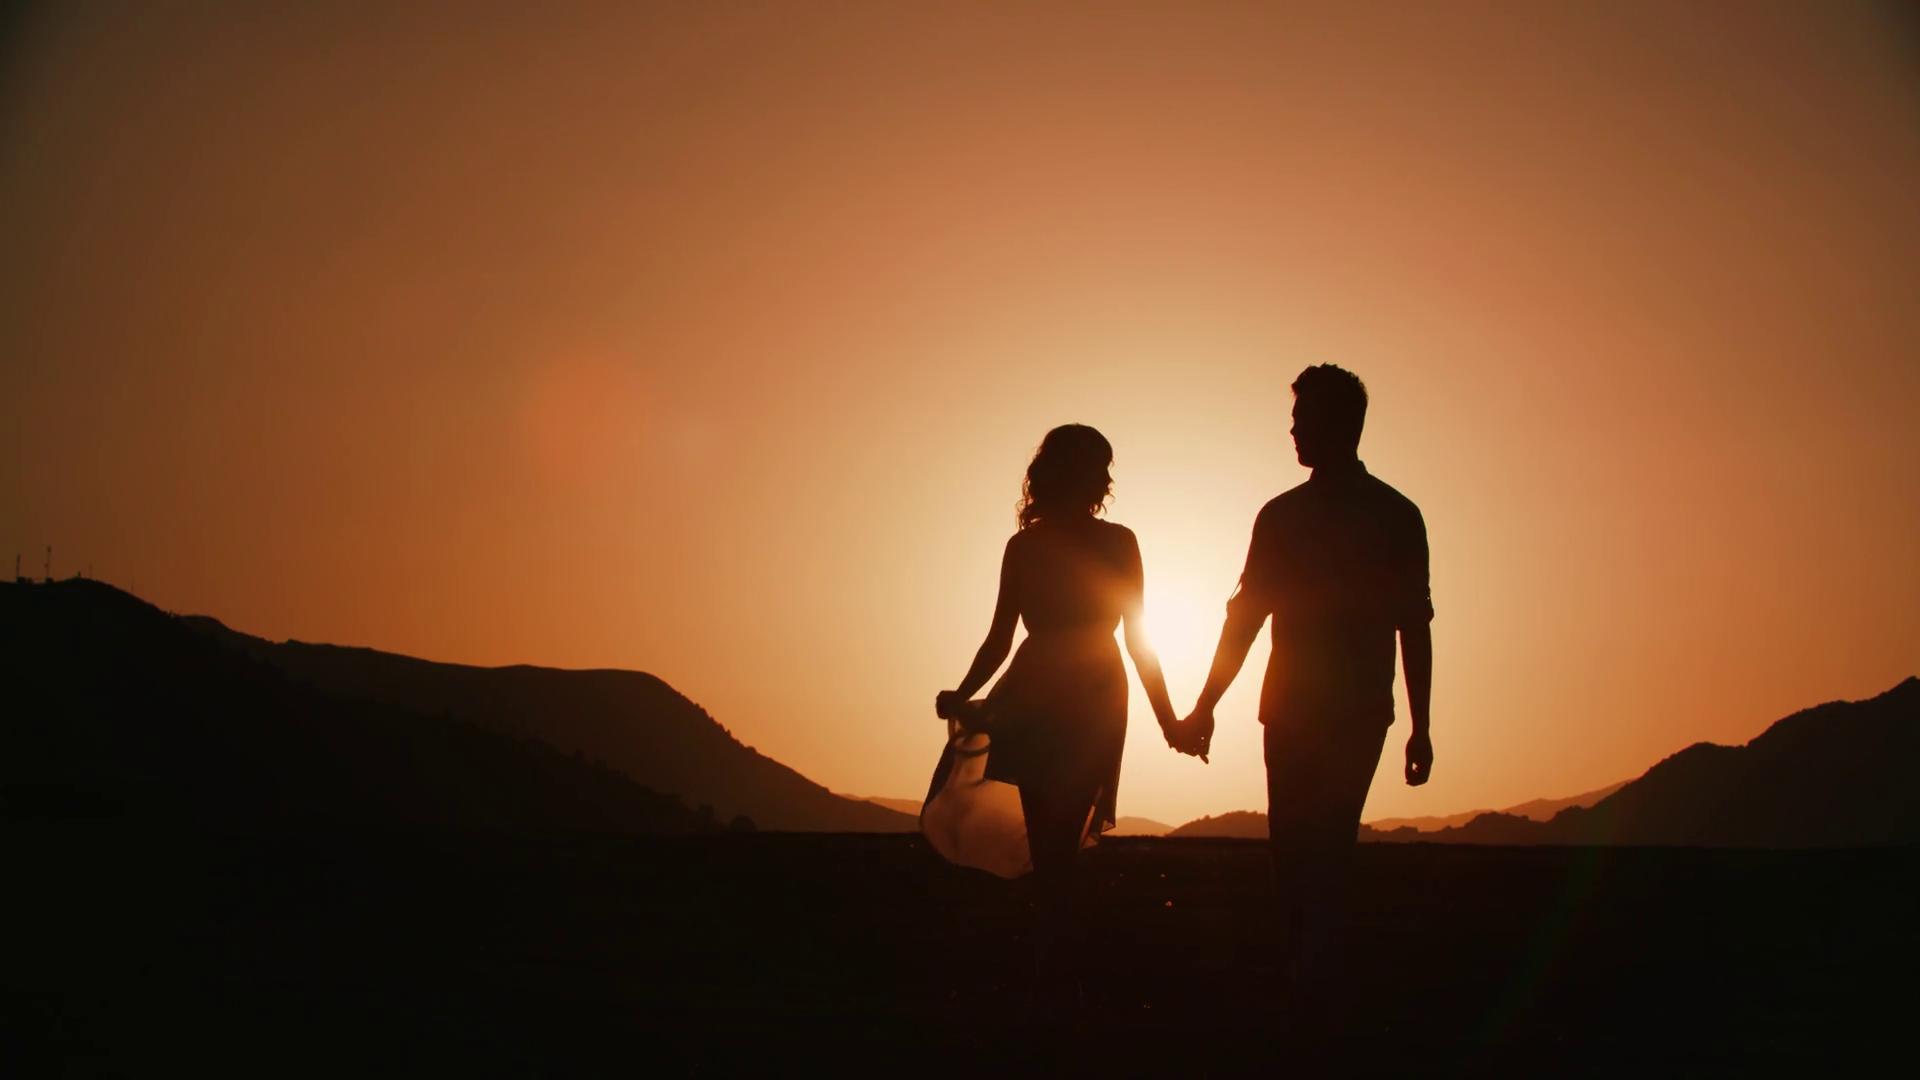 Silhouette Sunset Couple.